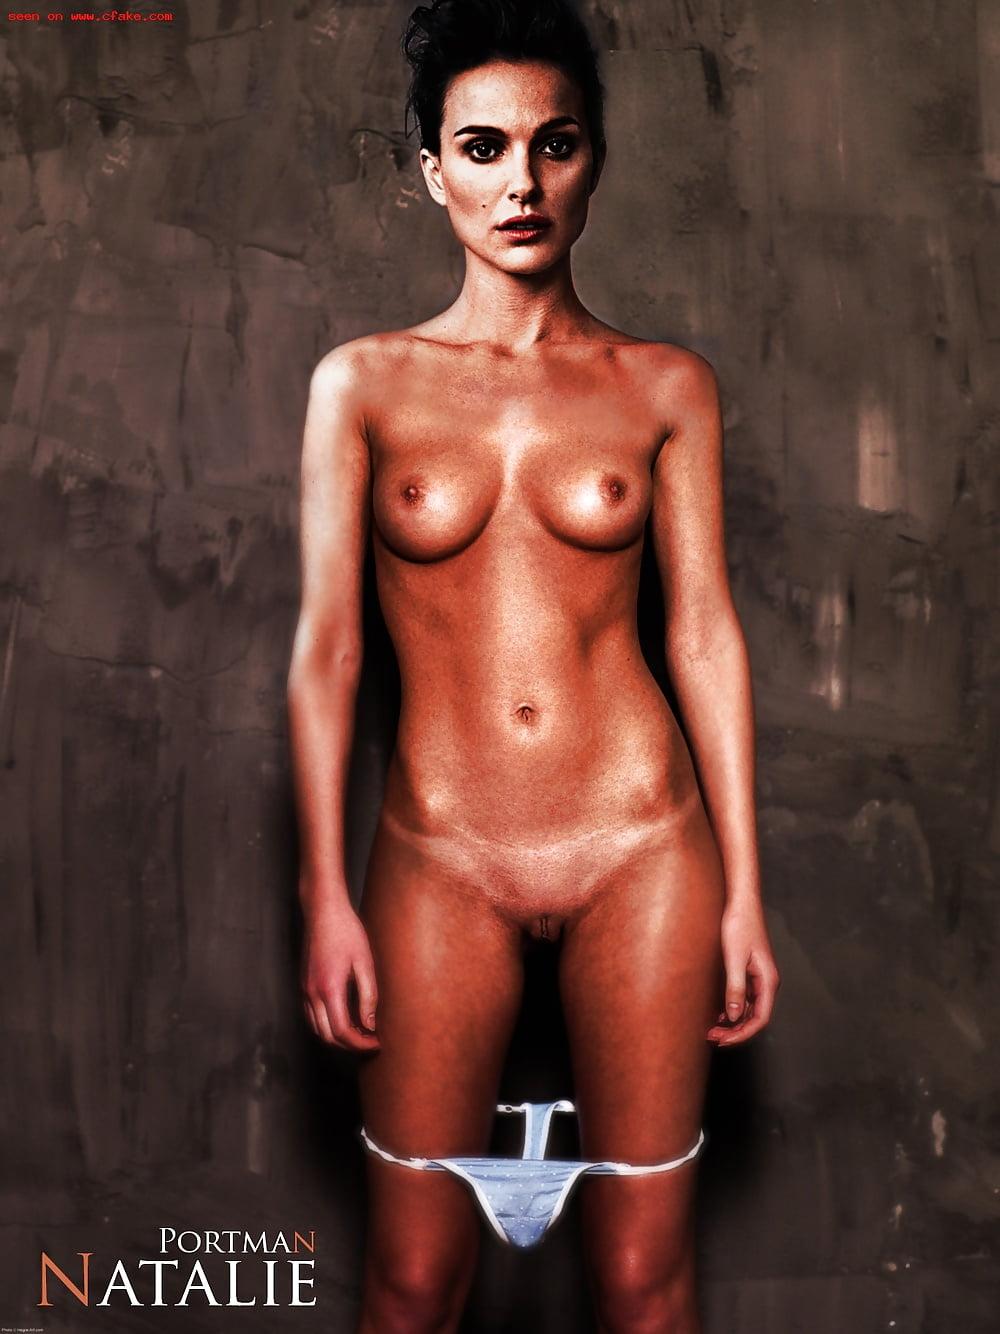 tumblr-natalie-portman-nude-poke-a-hot-ass-movie